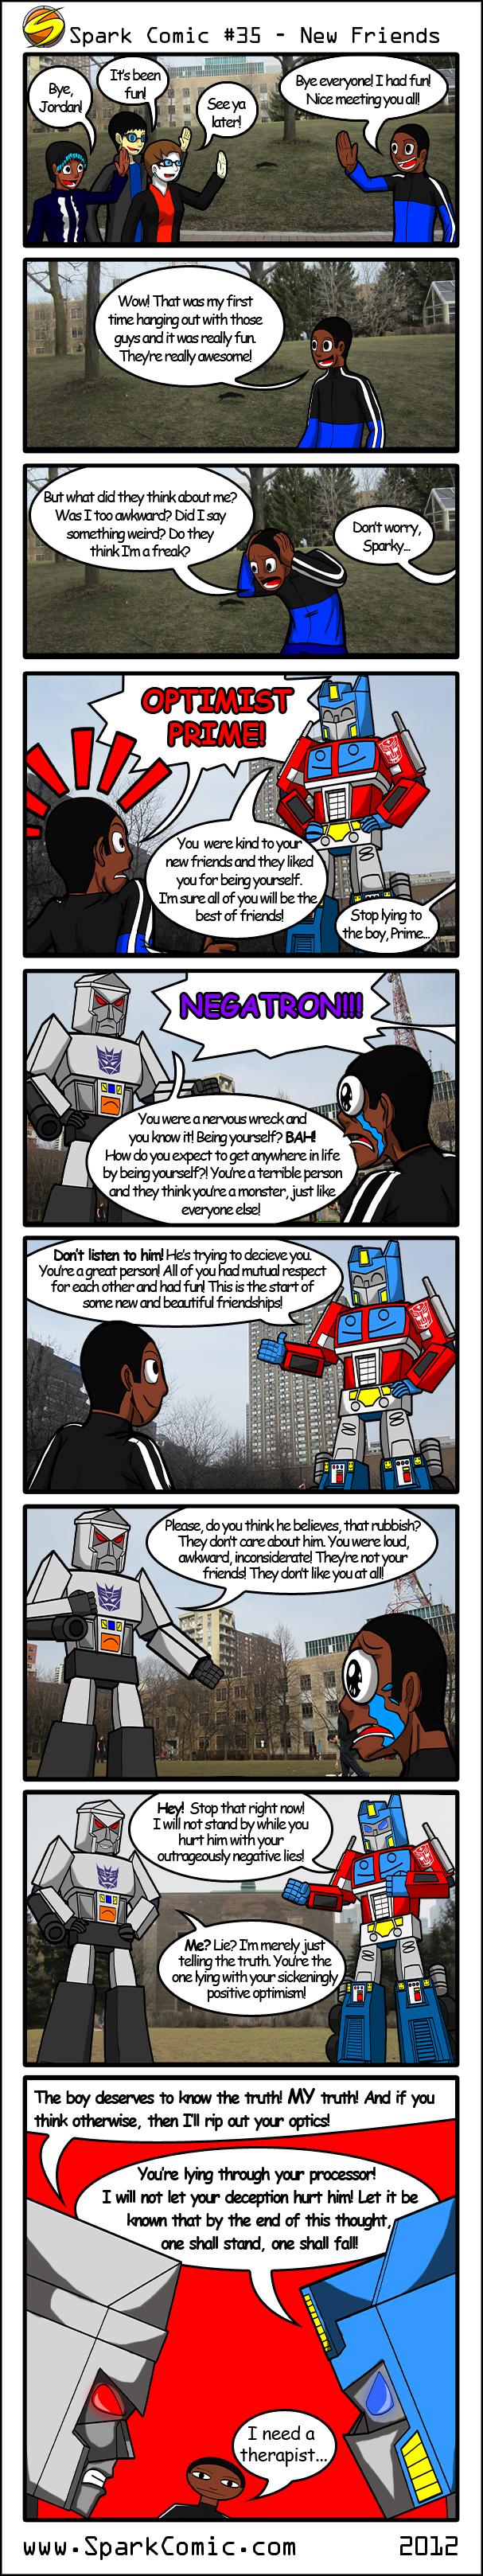 Spark Comic 35 - New Friends by SuperSparkplug